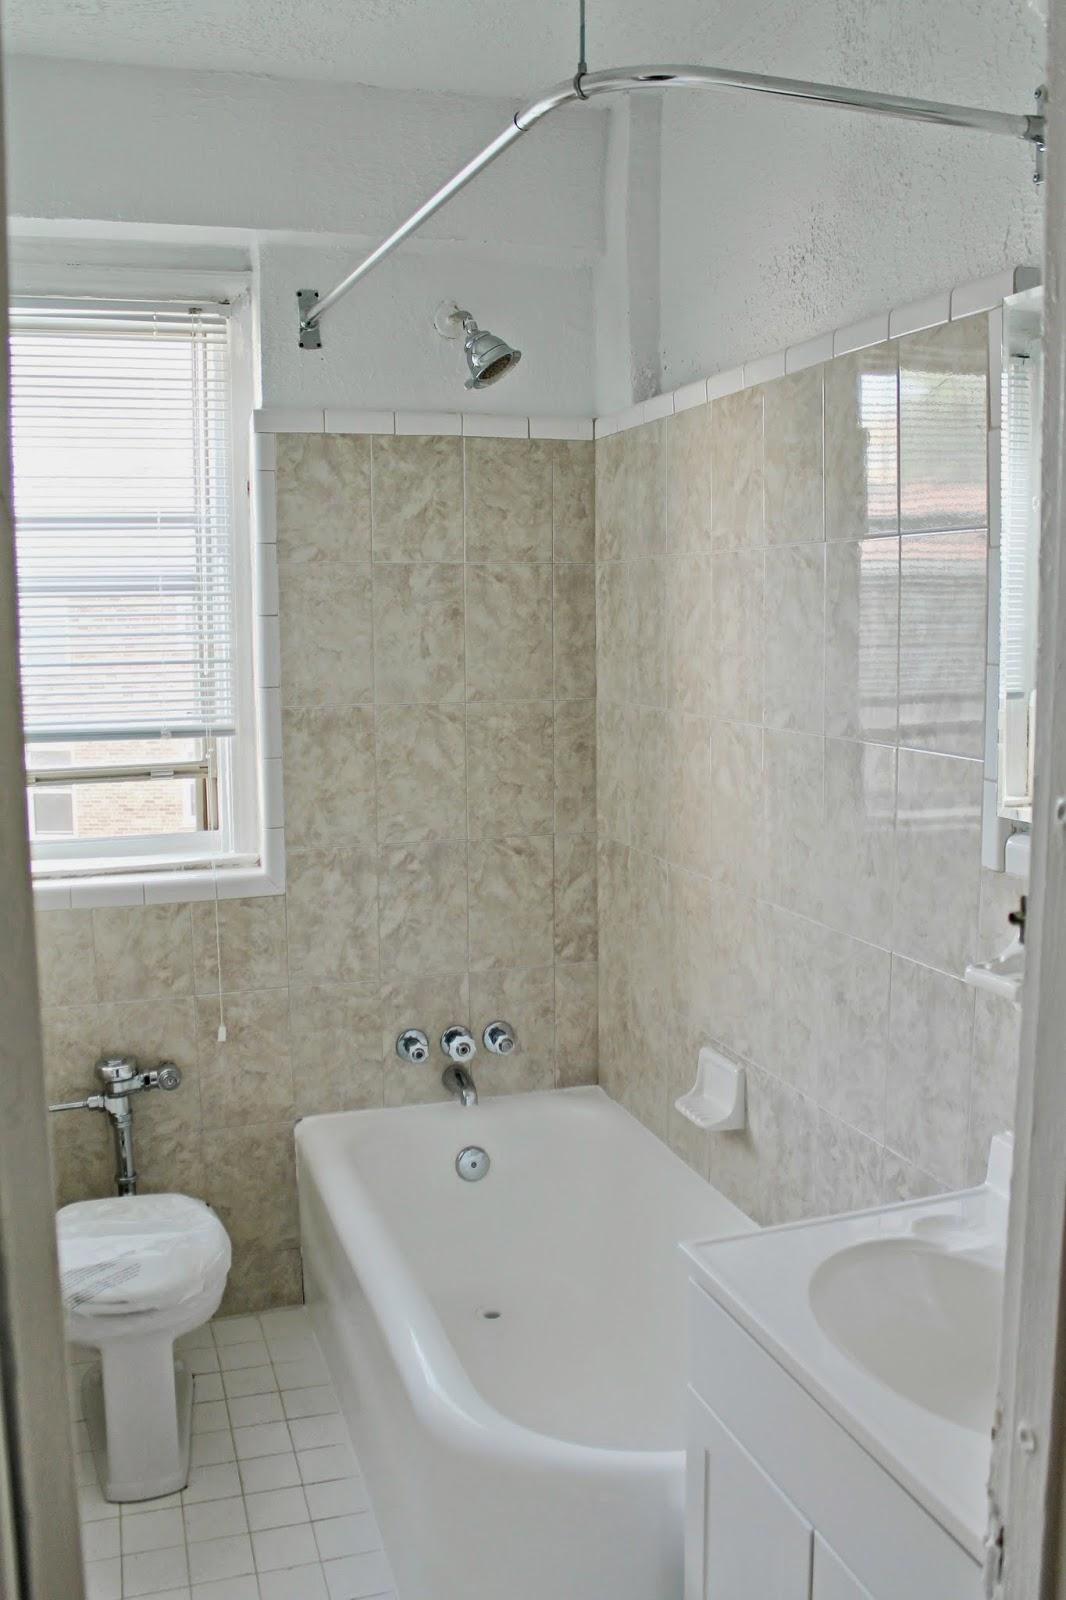 Bathroom Makeover Apartment apartment bathroom makeover reveal! - shannon claire